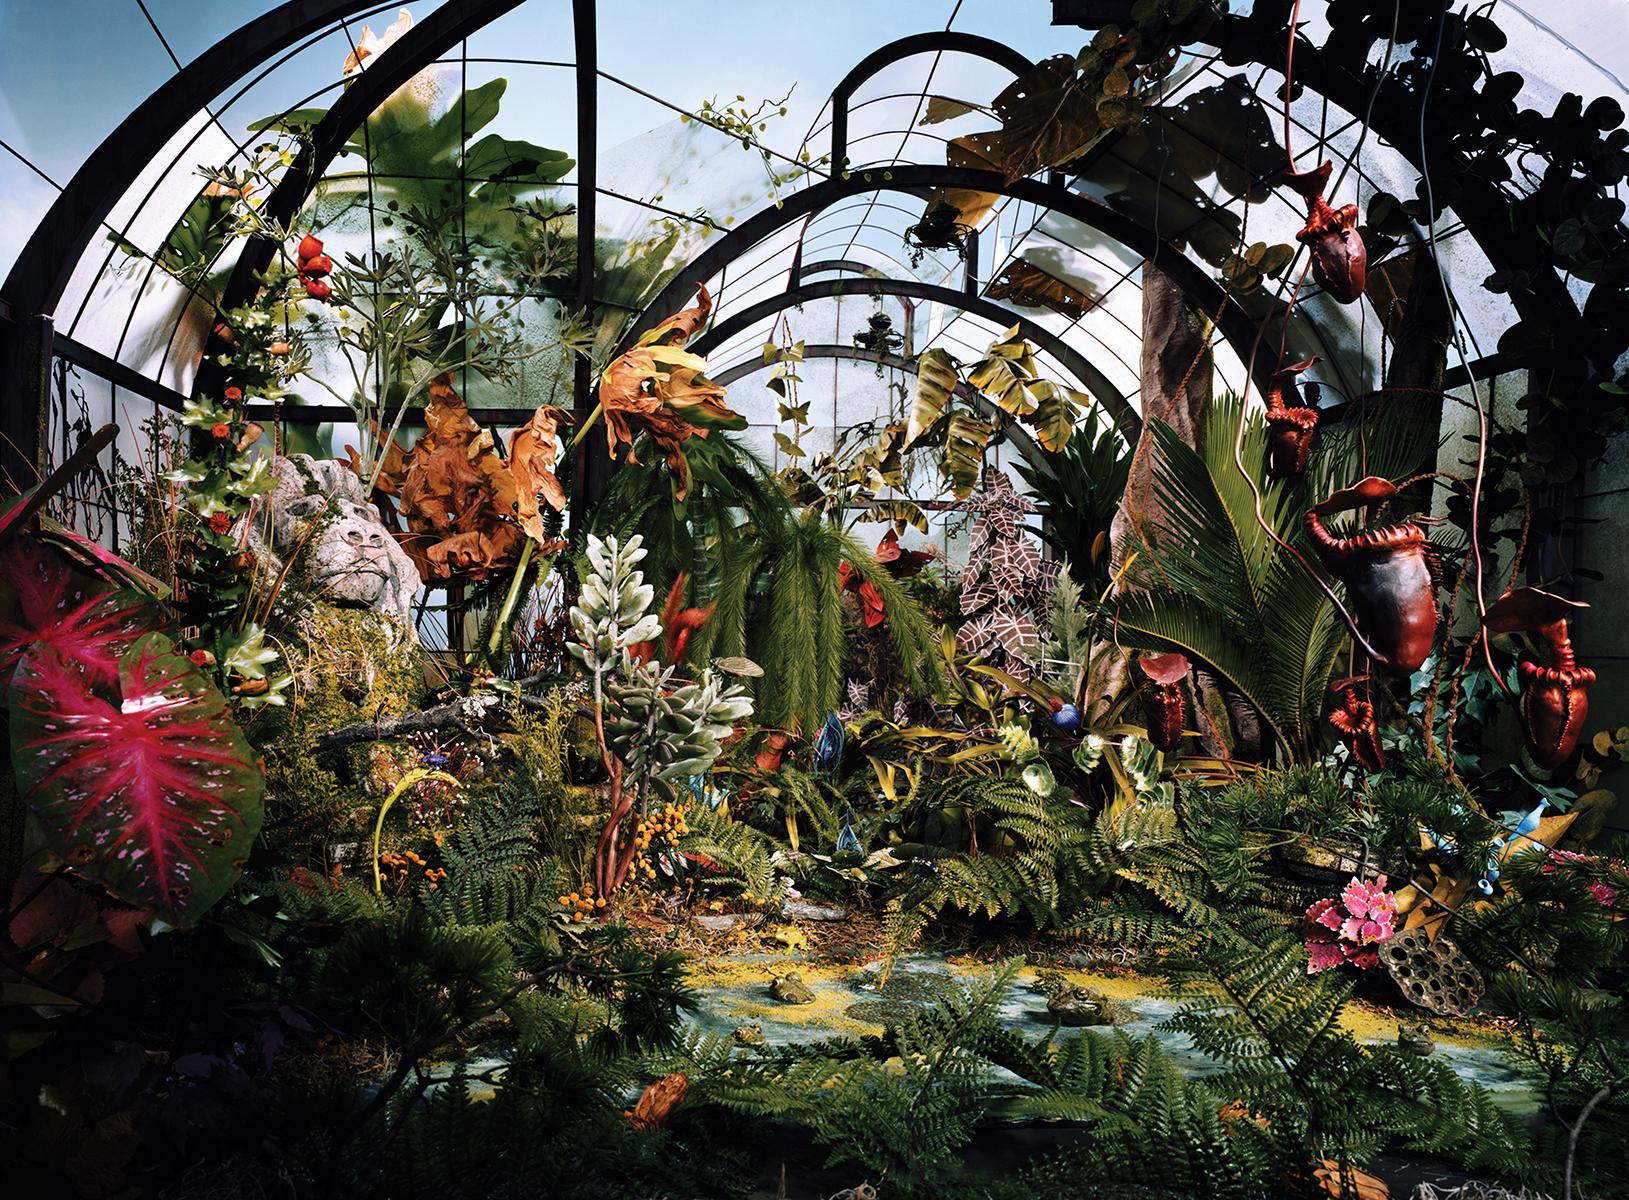 "Lori Nix and Kathleen Gerber, Botanic Gardens, 2008. Chromogenic Print, 48 x 65"". Courtesy of Bau-Xi Photo."